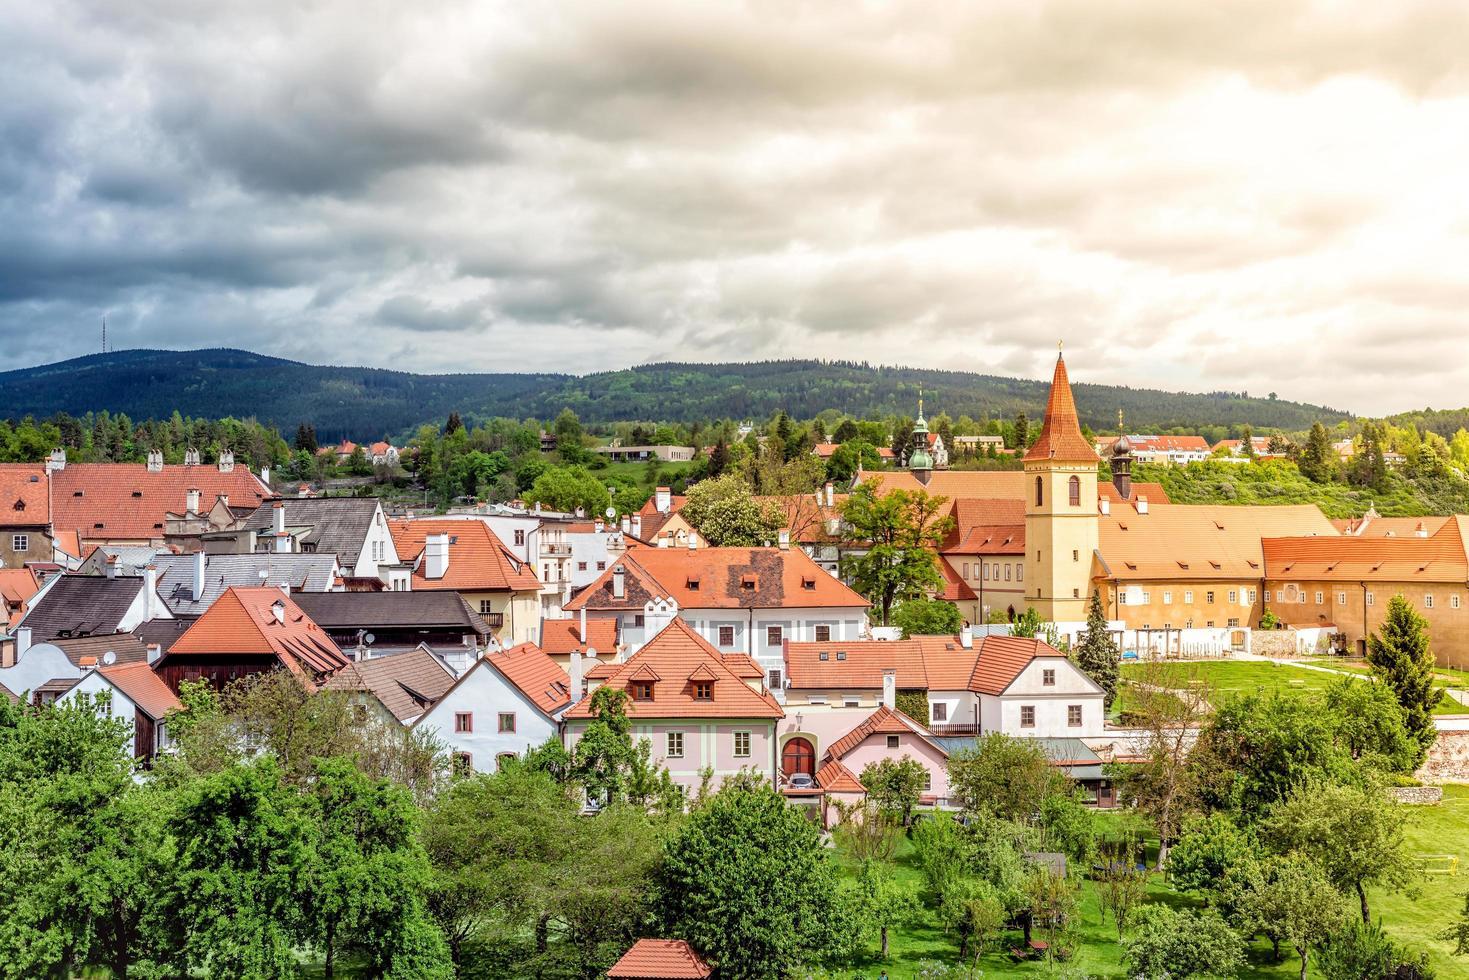 uitzicht op de oude stad Cesky Krumlov in Tsjechië foto